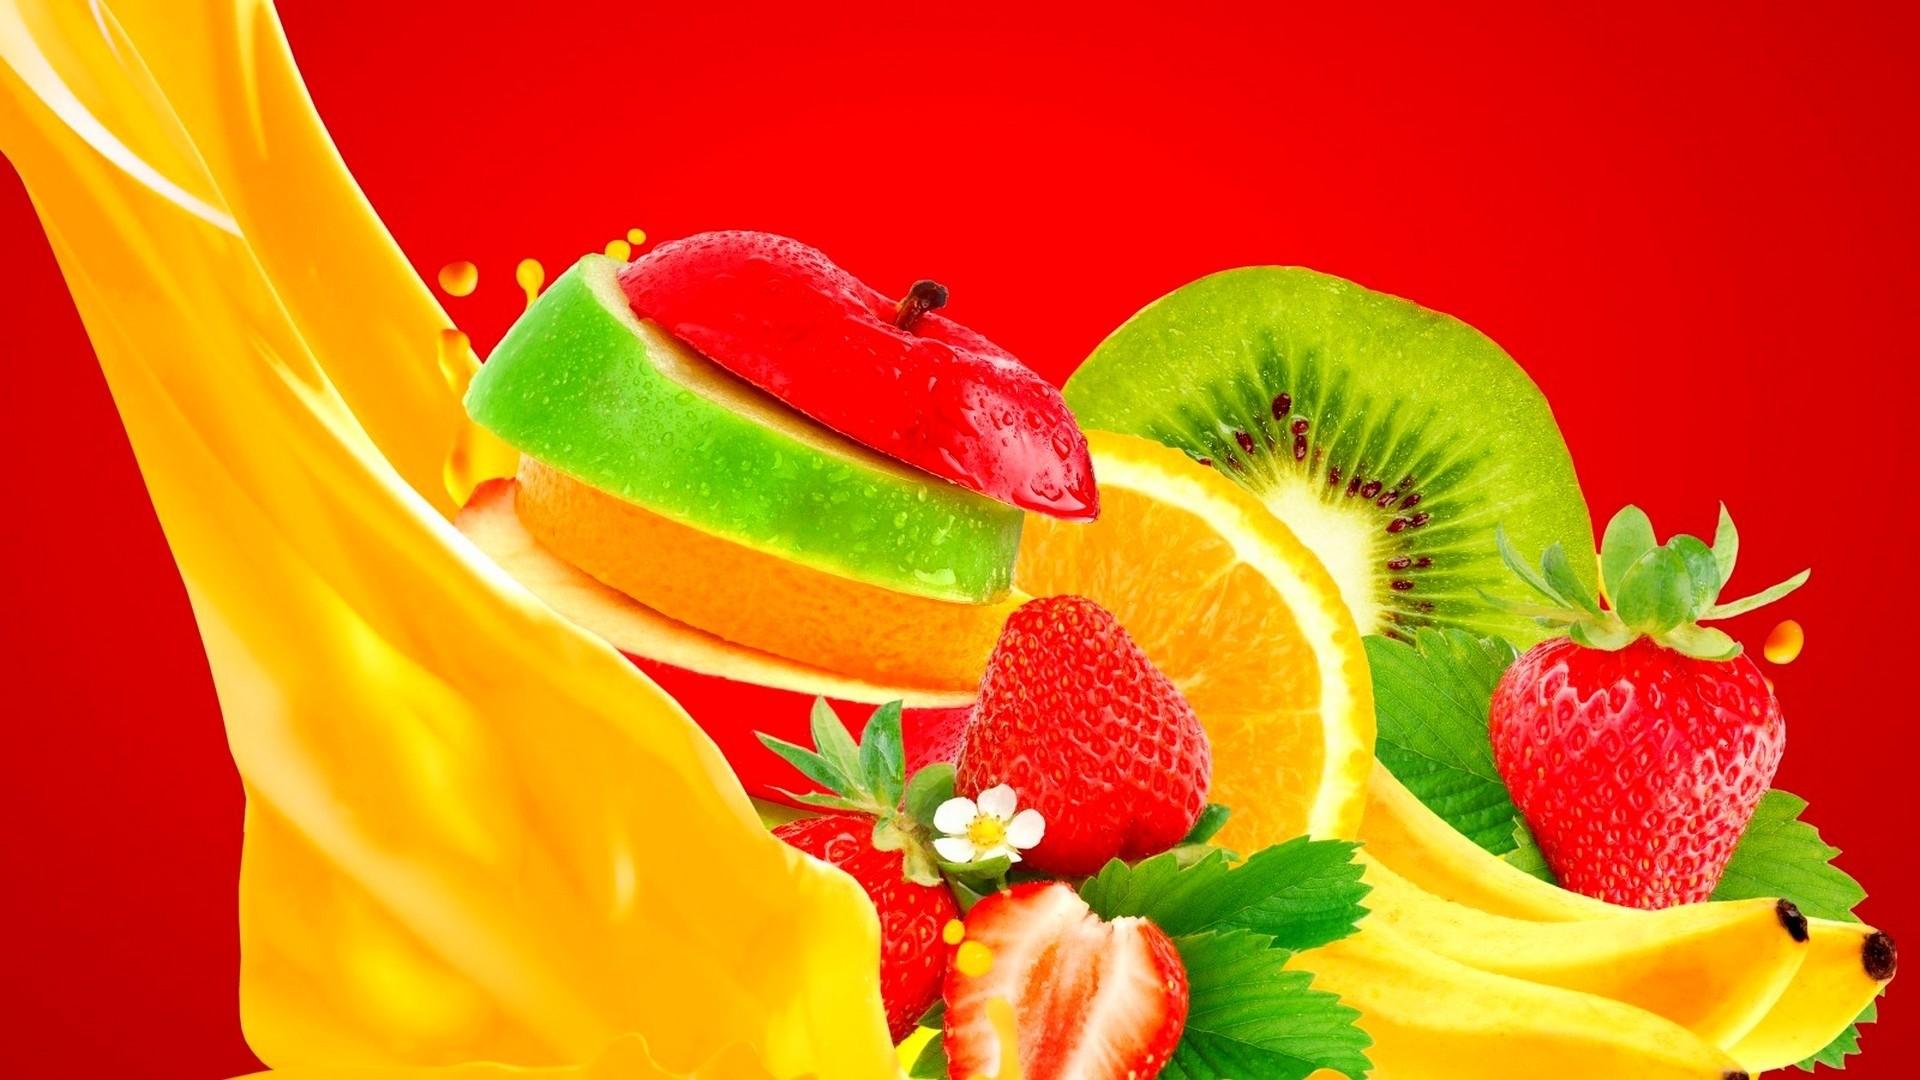 Fruit Wallpaper image hd